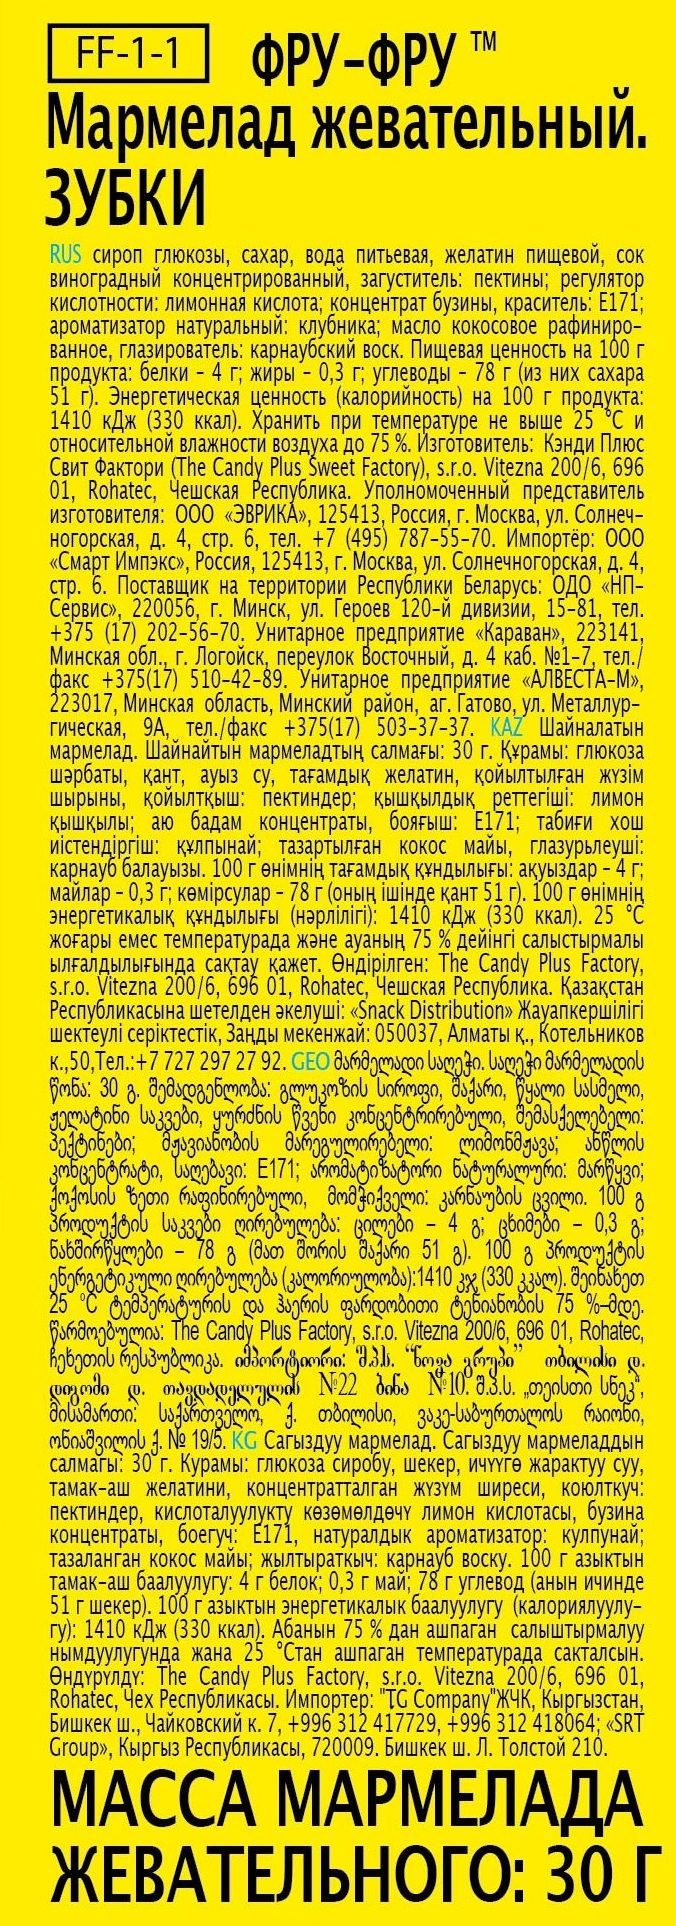 Жевательный мармелад ФРУ-ФРУ «Зубки» 30 г